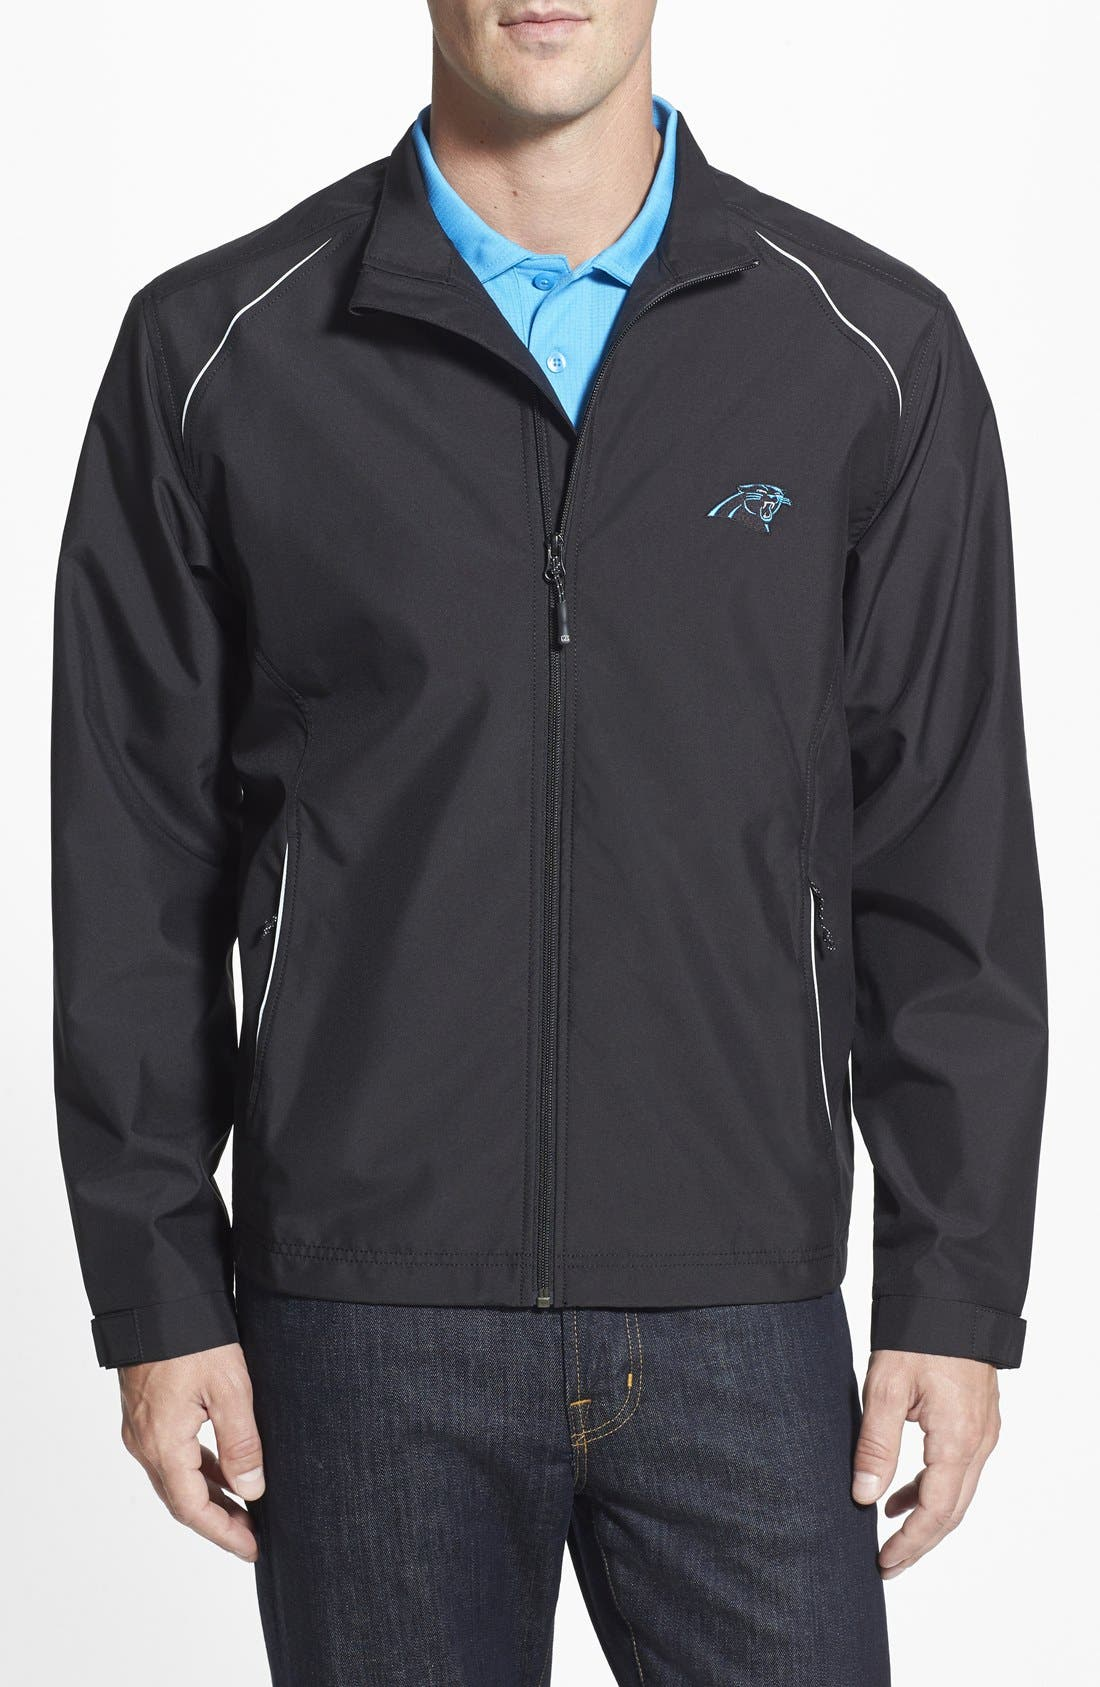 Carolina Panthers - Beacon WeatherTec Wind & Water Resistant Jacket,                         Main,                         color, Black